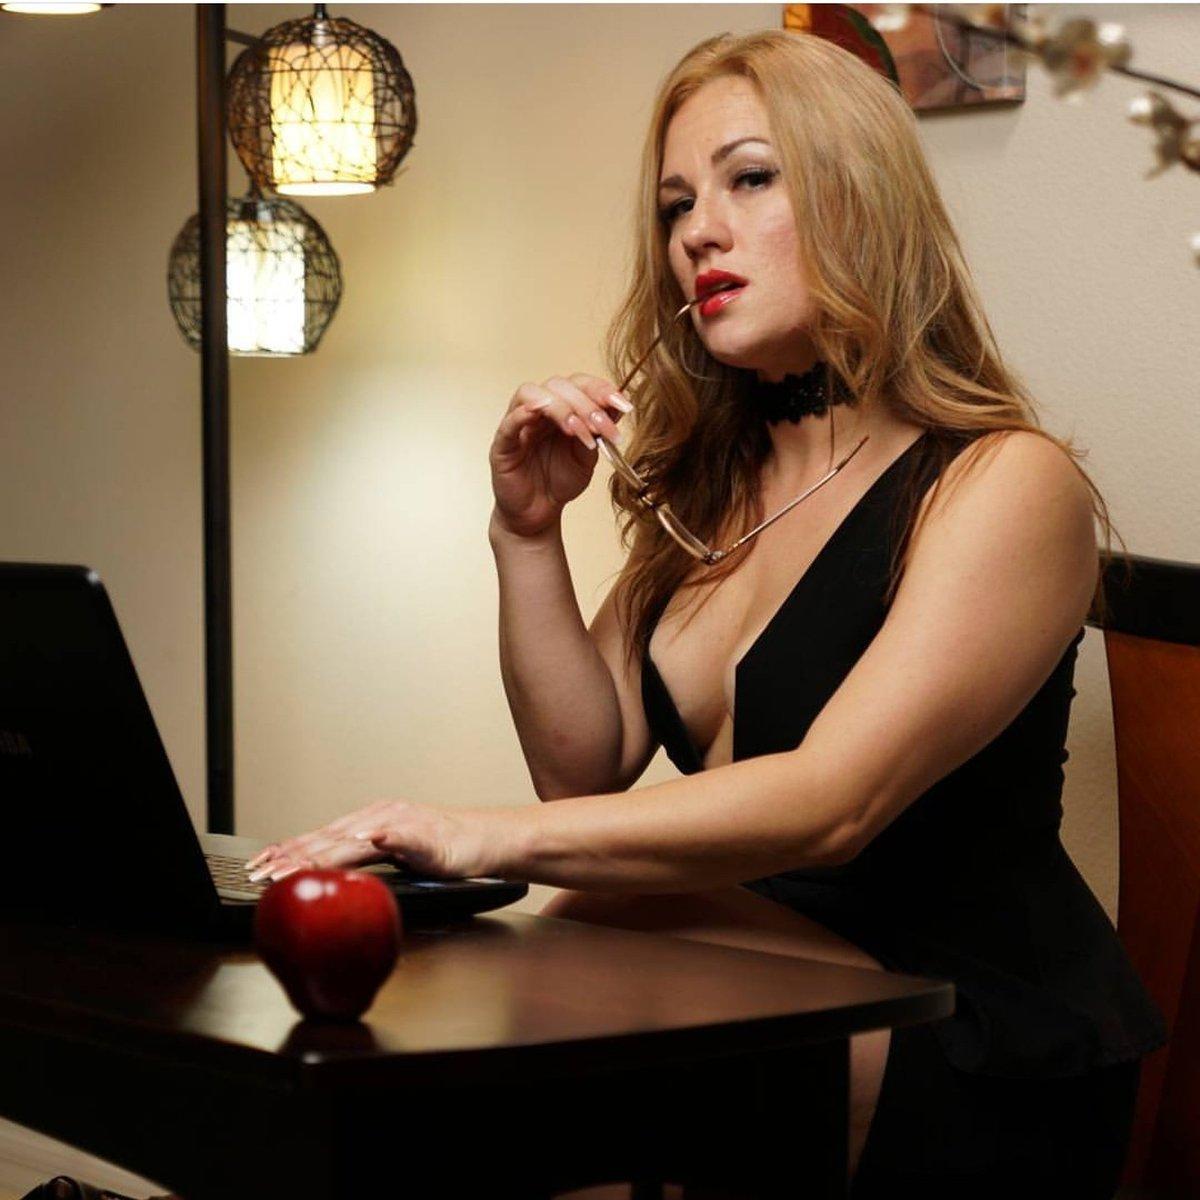 Alex Starr Porn Tube shelovesitblack: alex marie